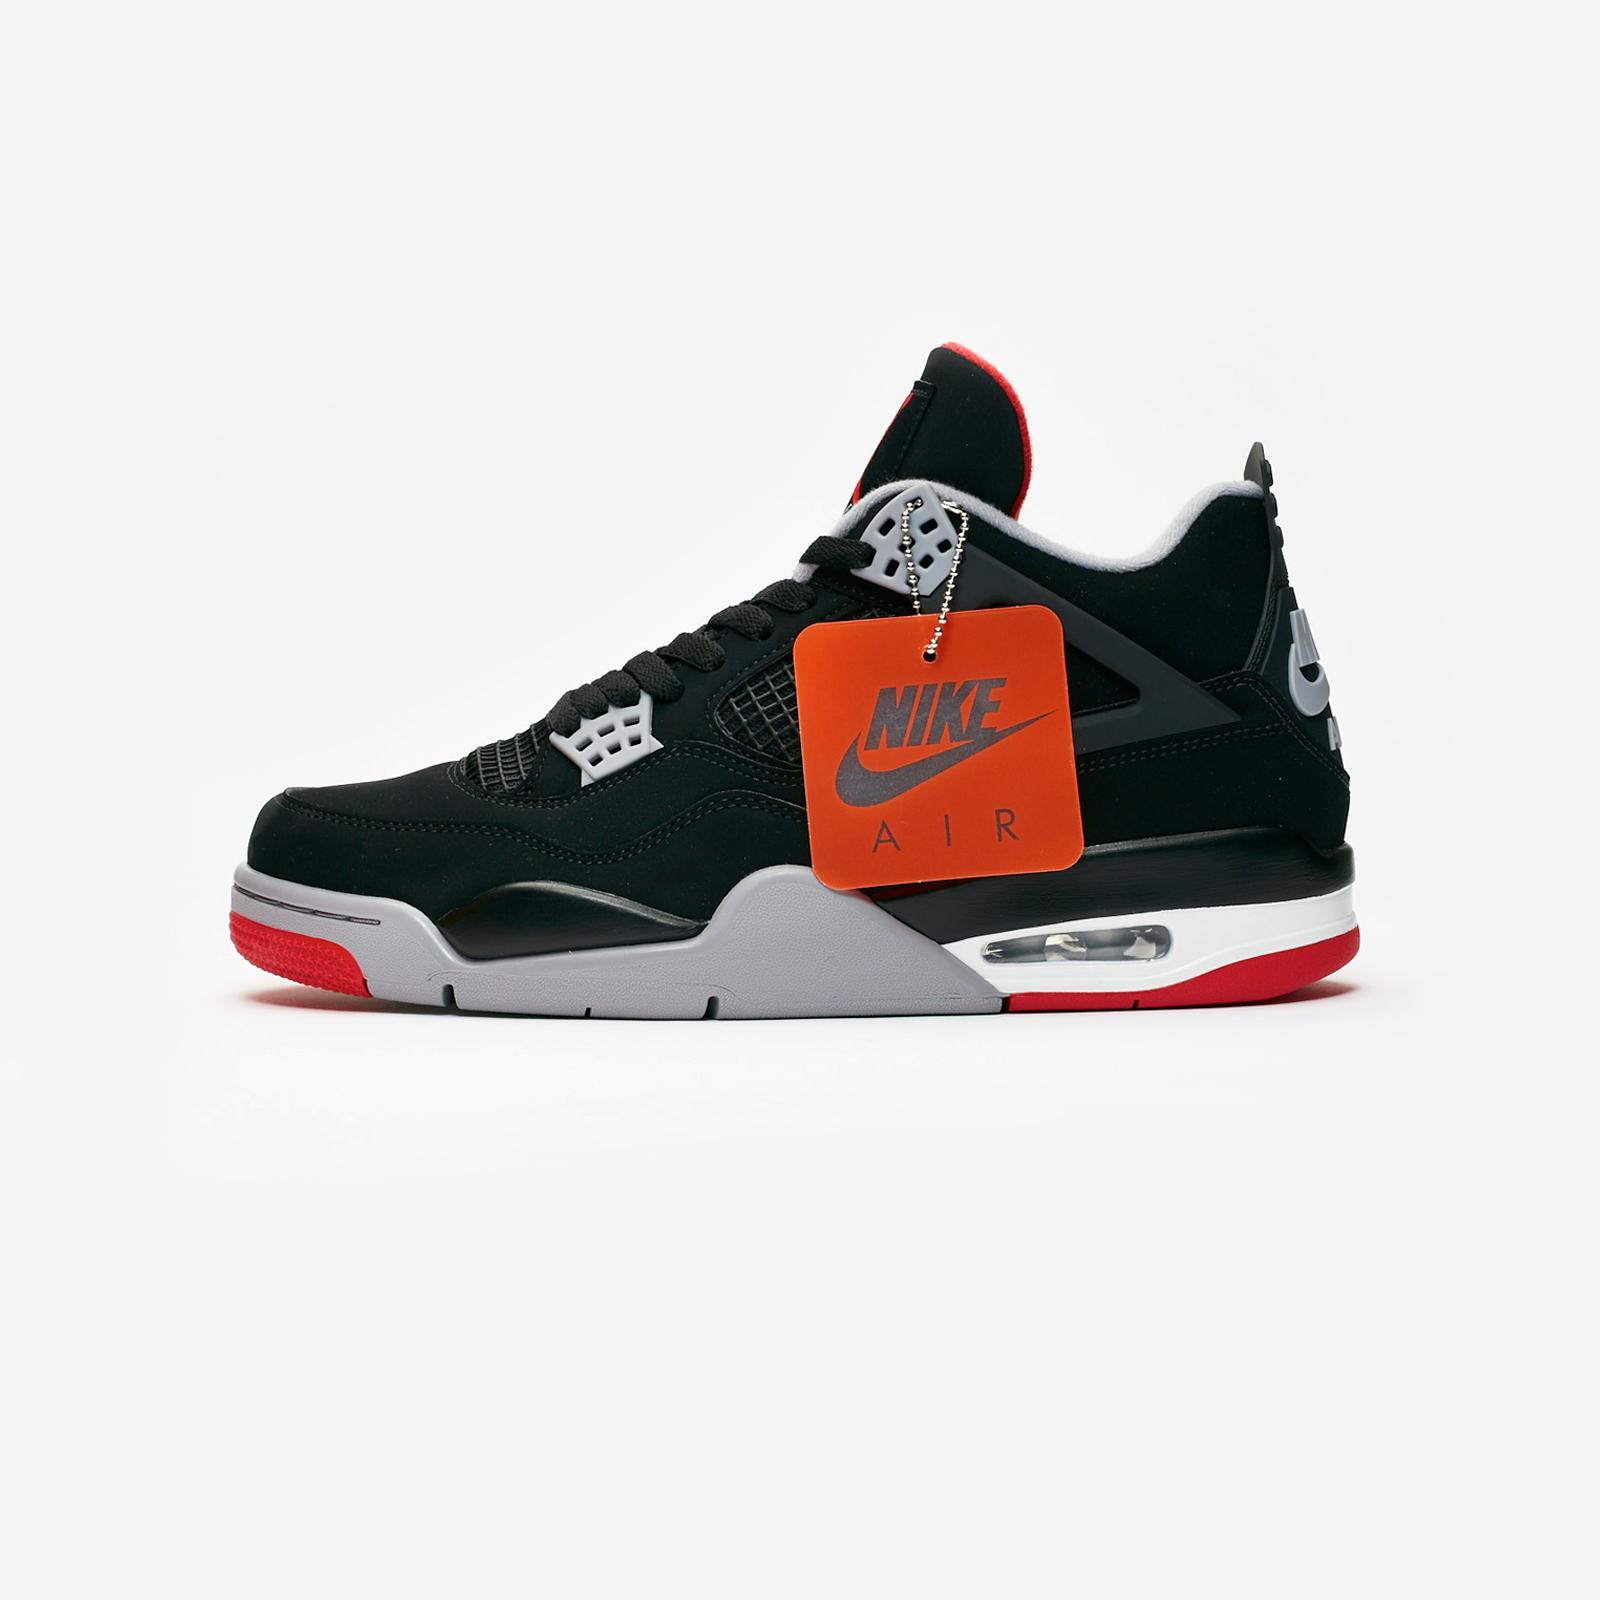 52625659103 Jordan Brand Air Jordan 4 Retro - 308497-060 - Sneakersnstuff | sneakers &  streetwear online since 1999